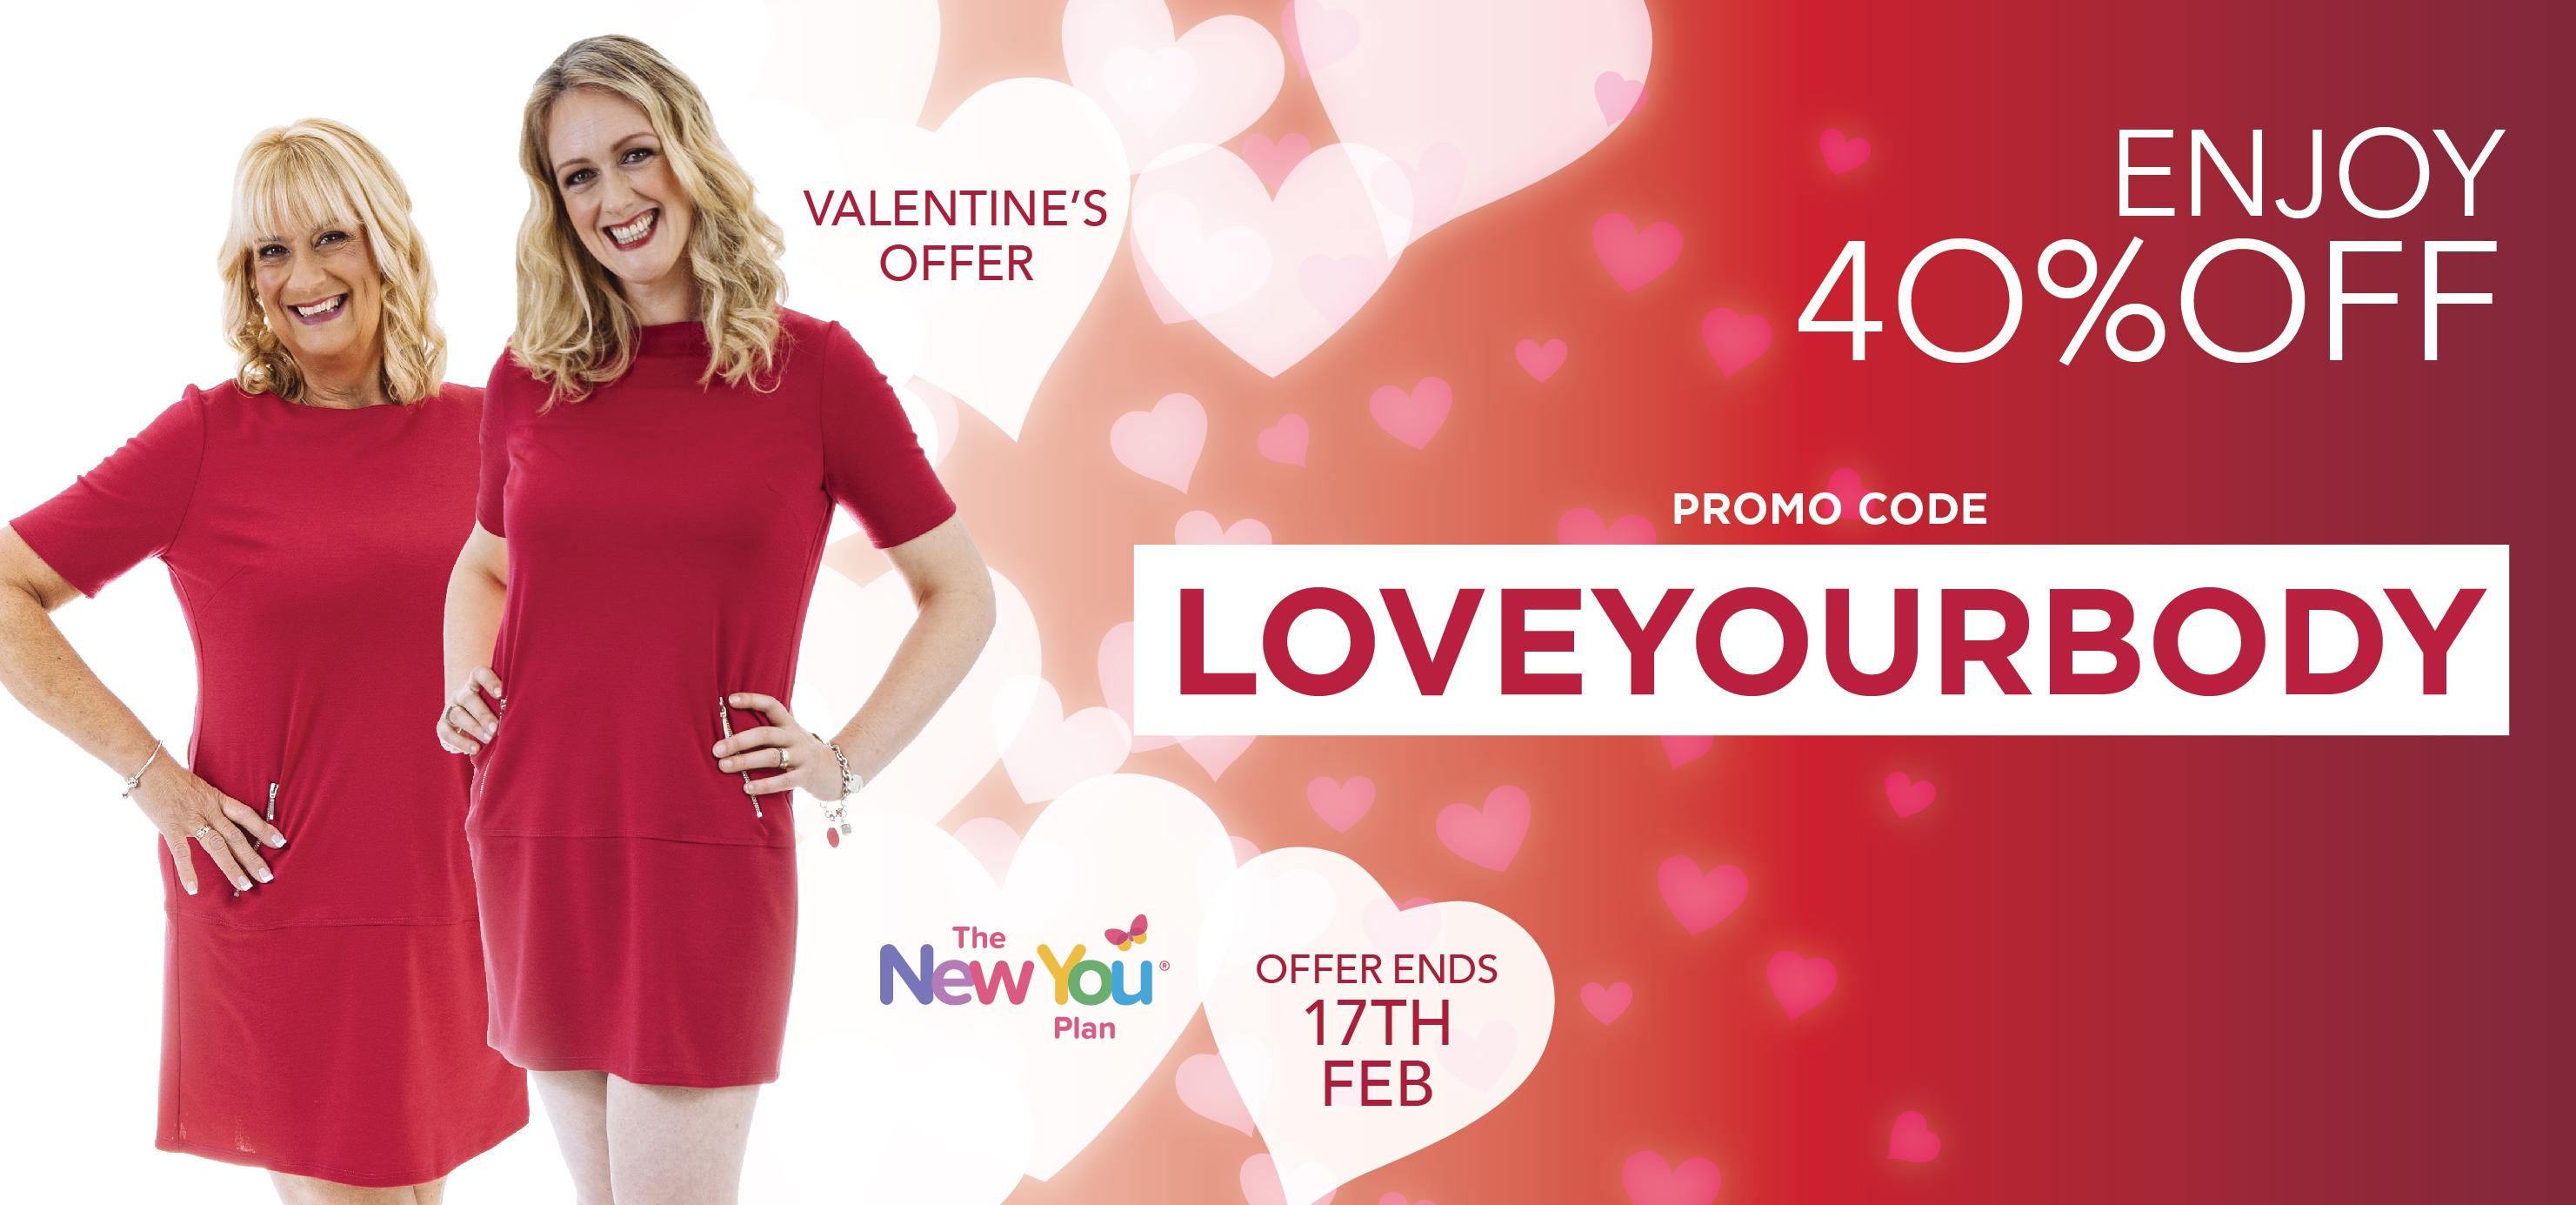 Love Your Body Feb 17 v2-01